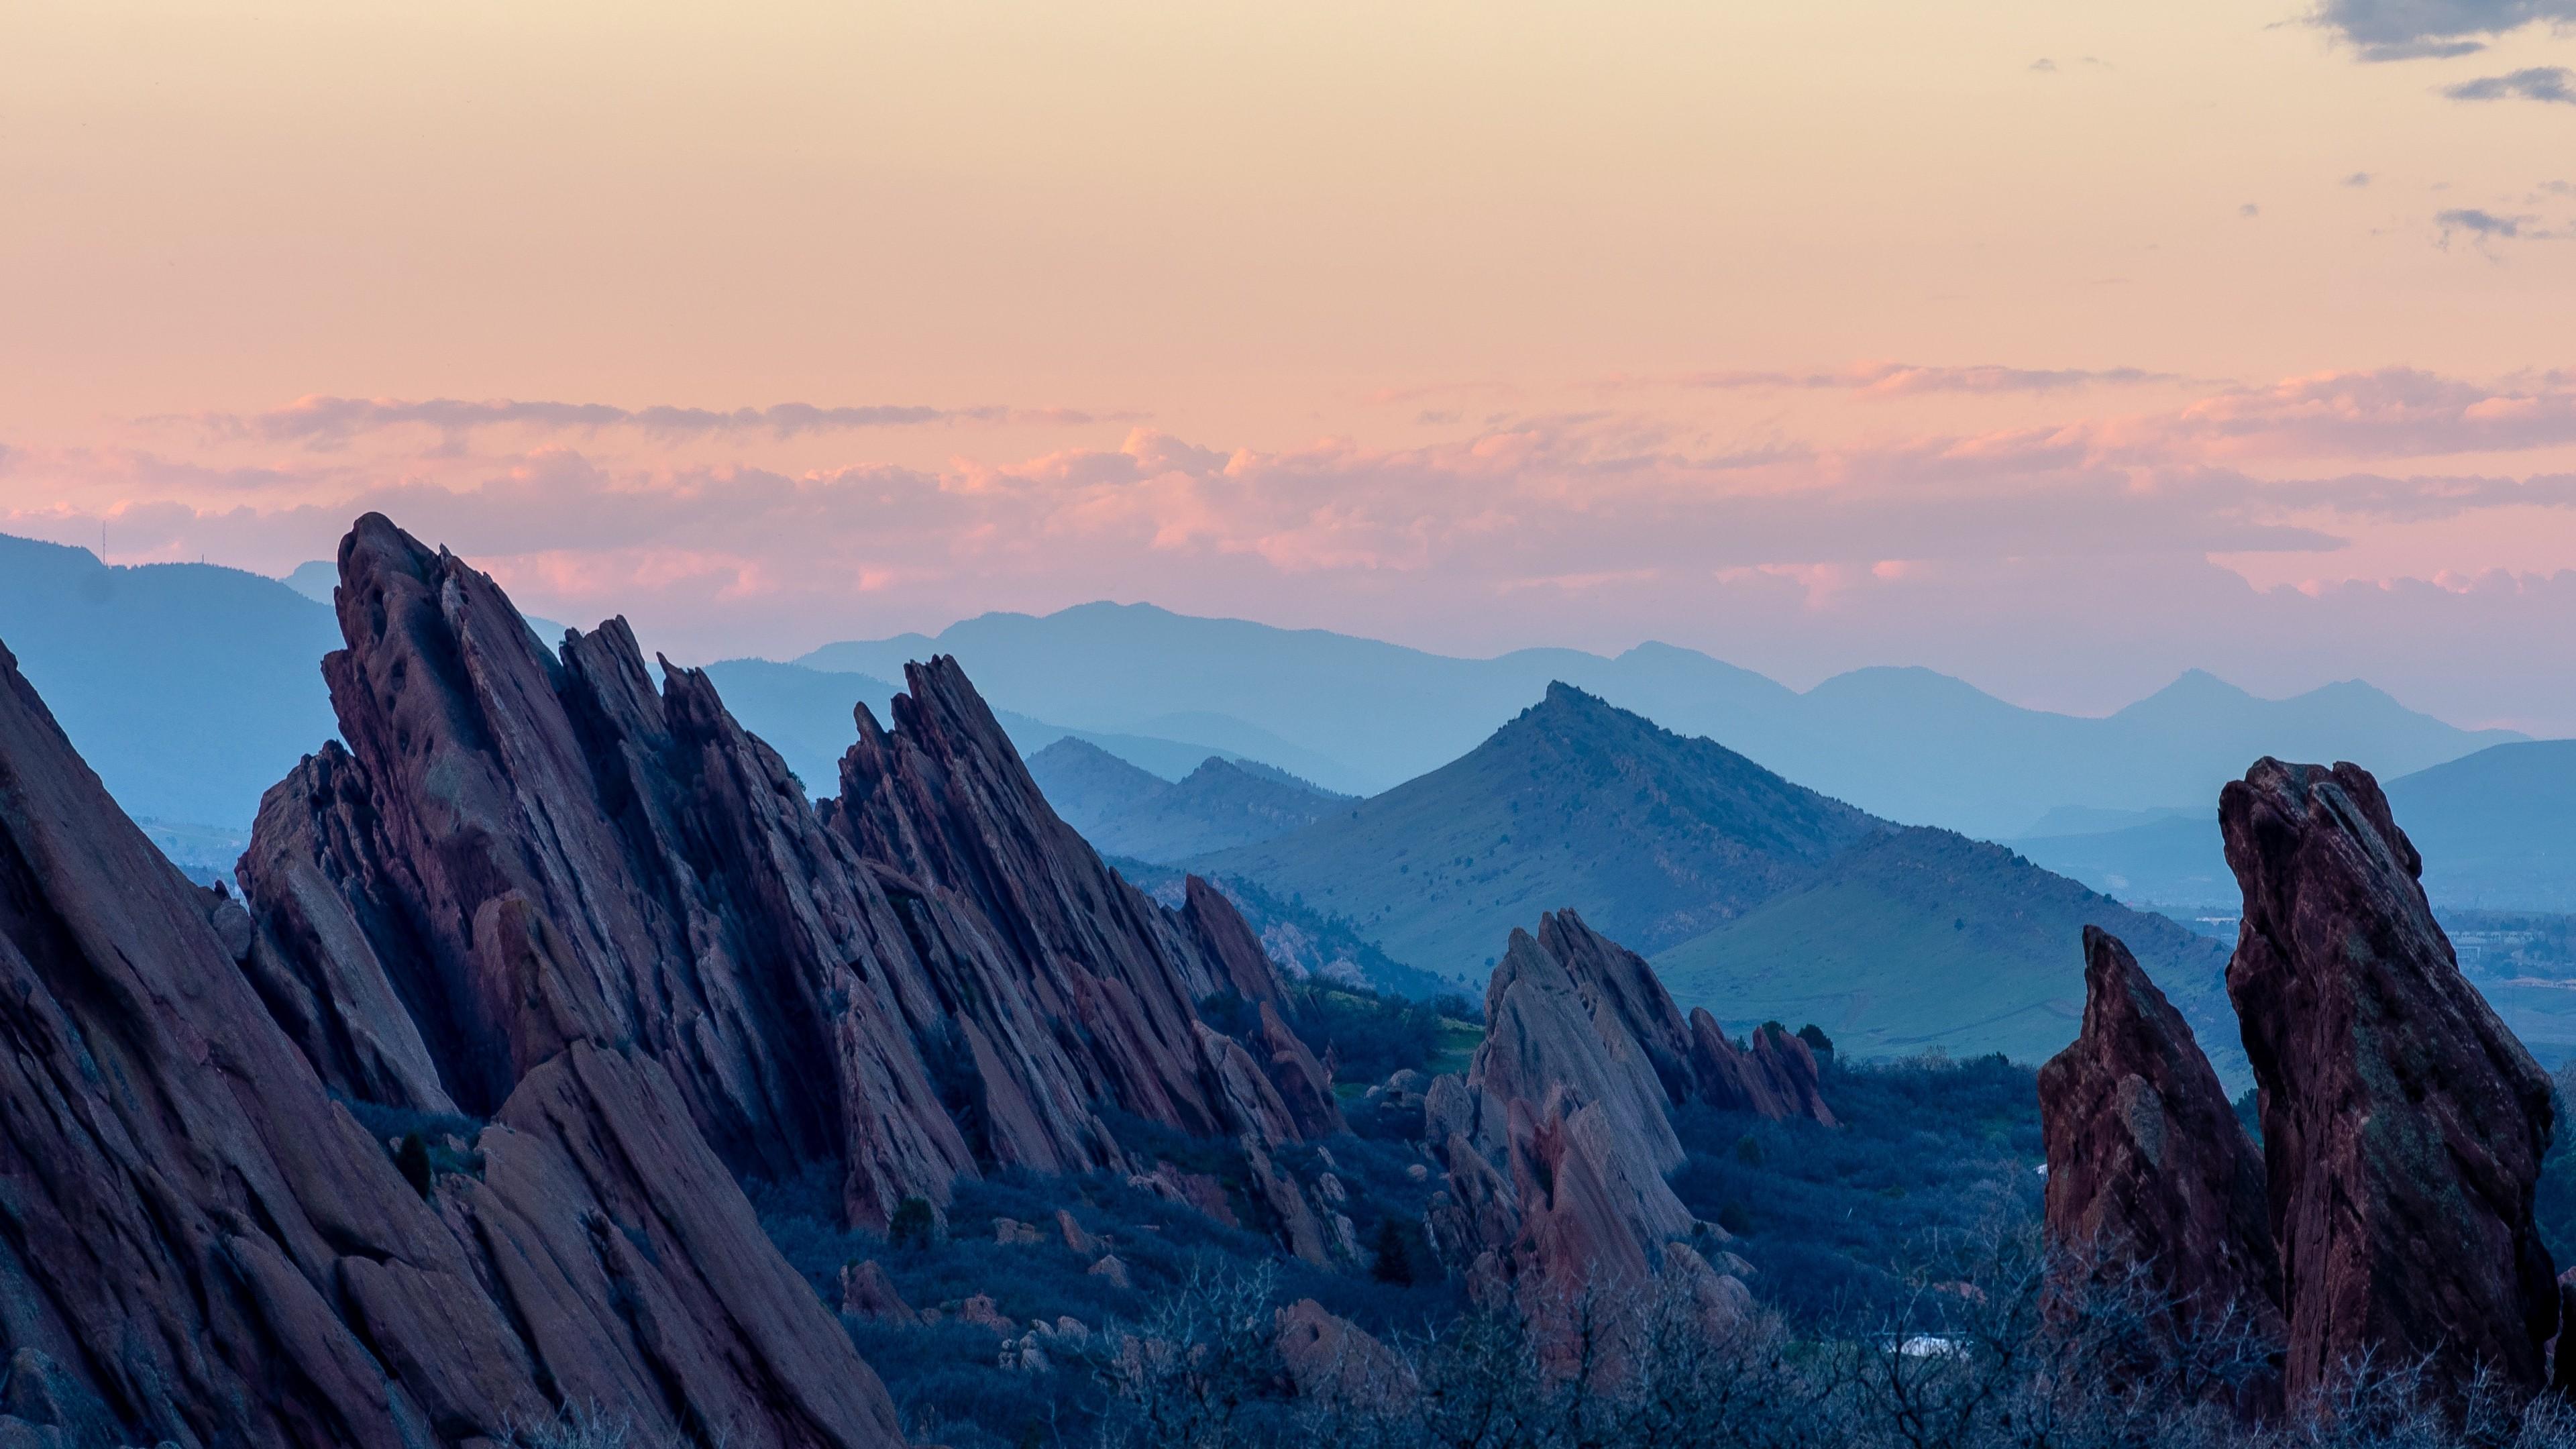 4k Mountains Rocks Landscape Wallpaper 3840x2160